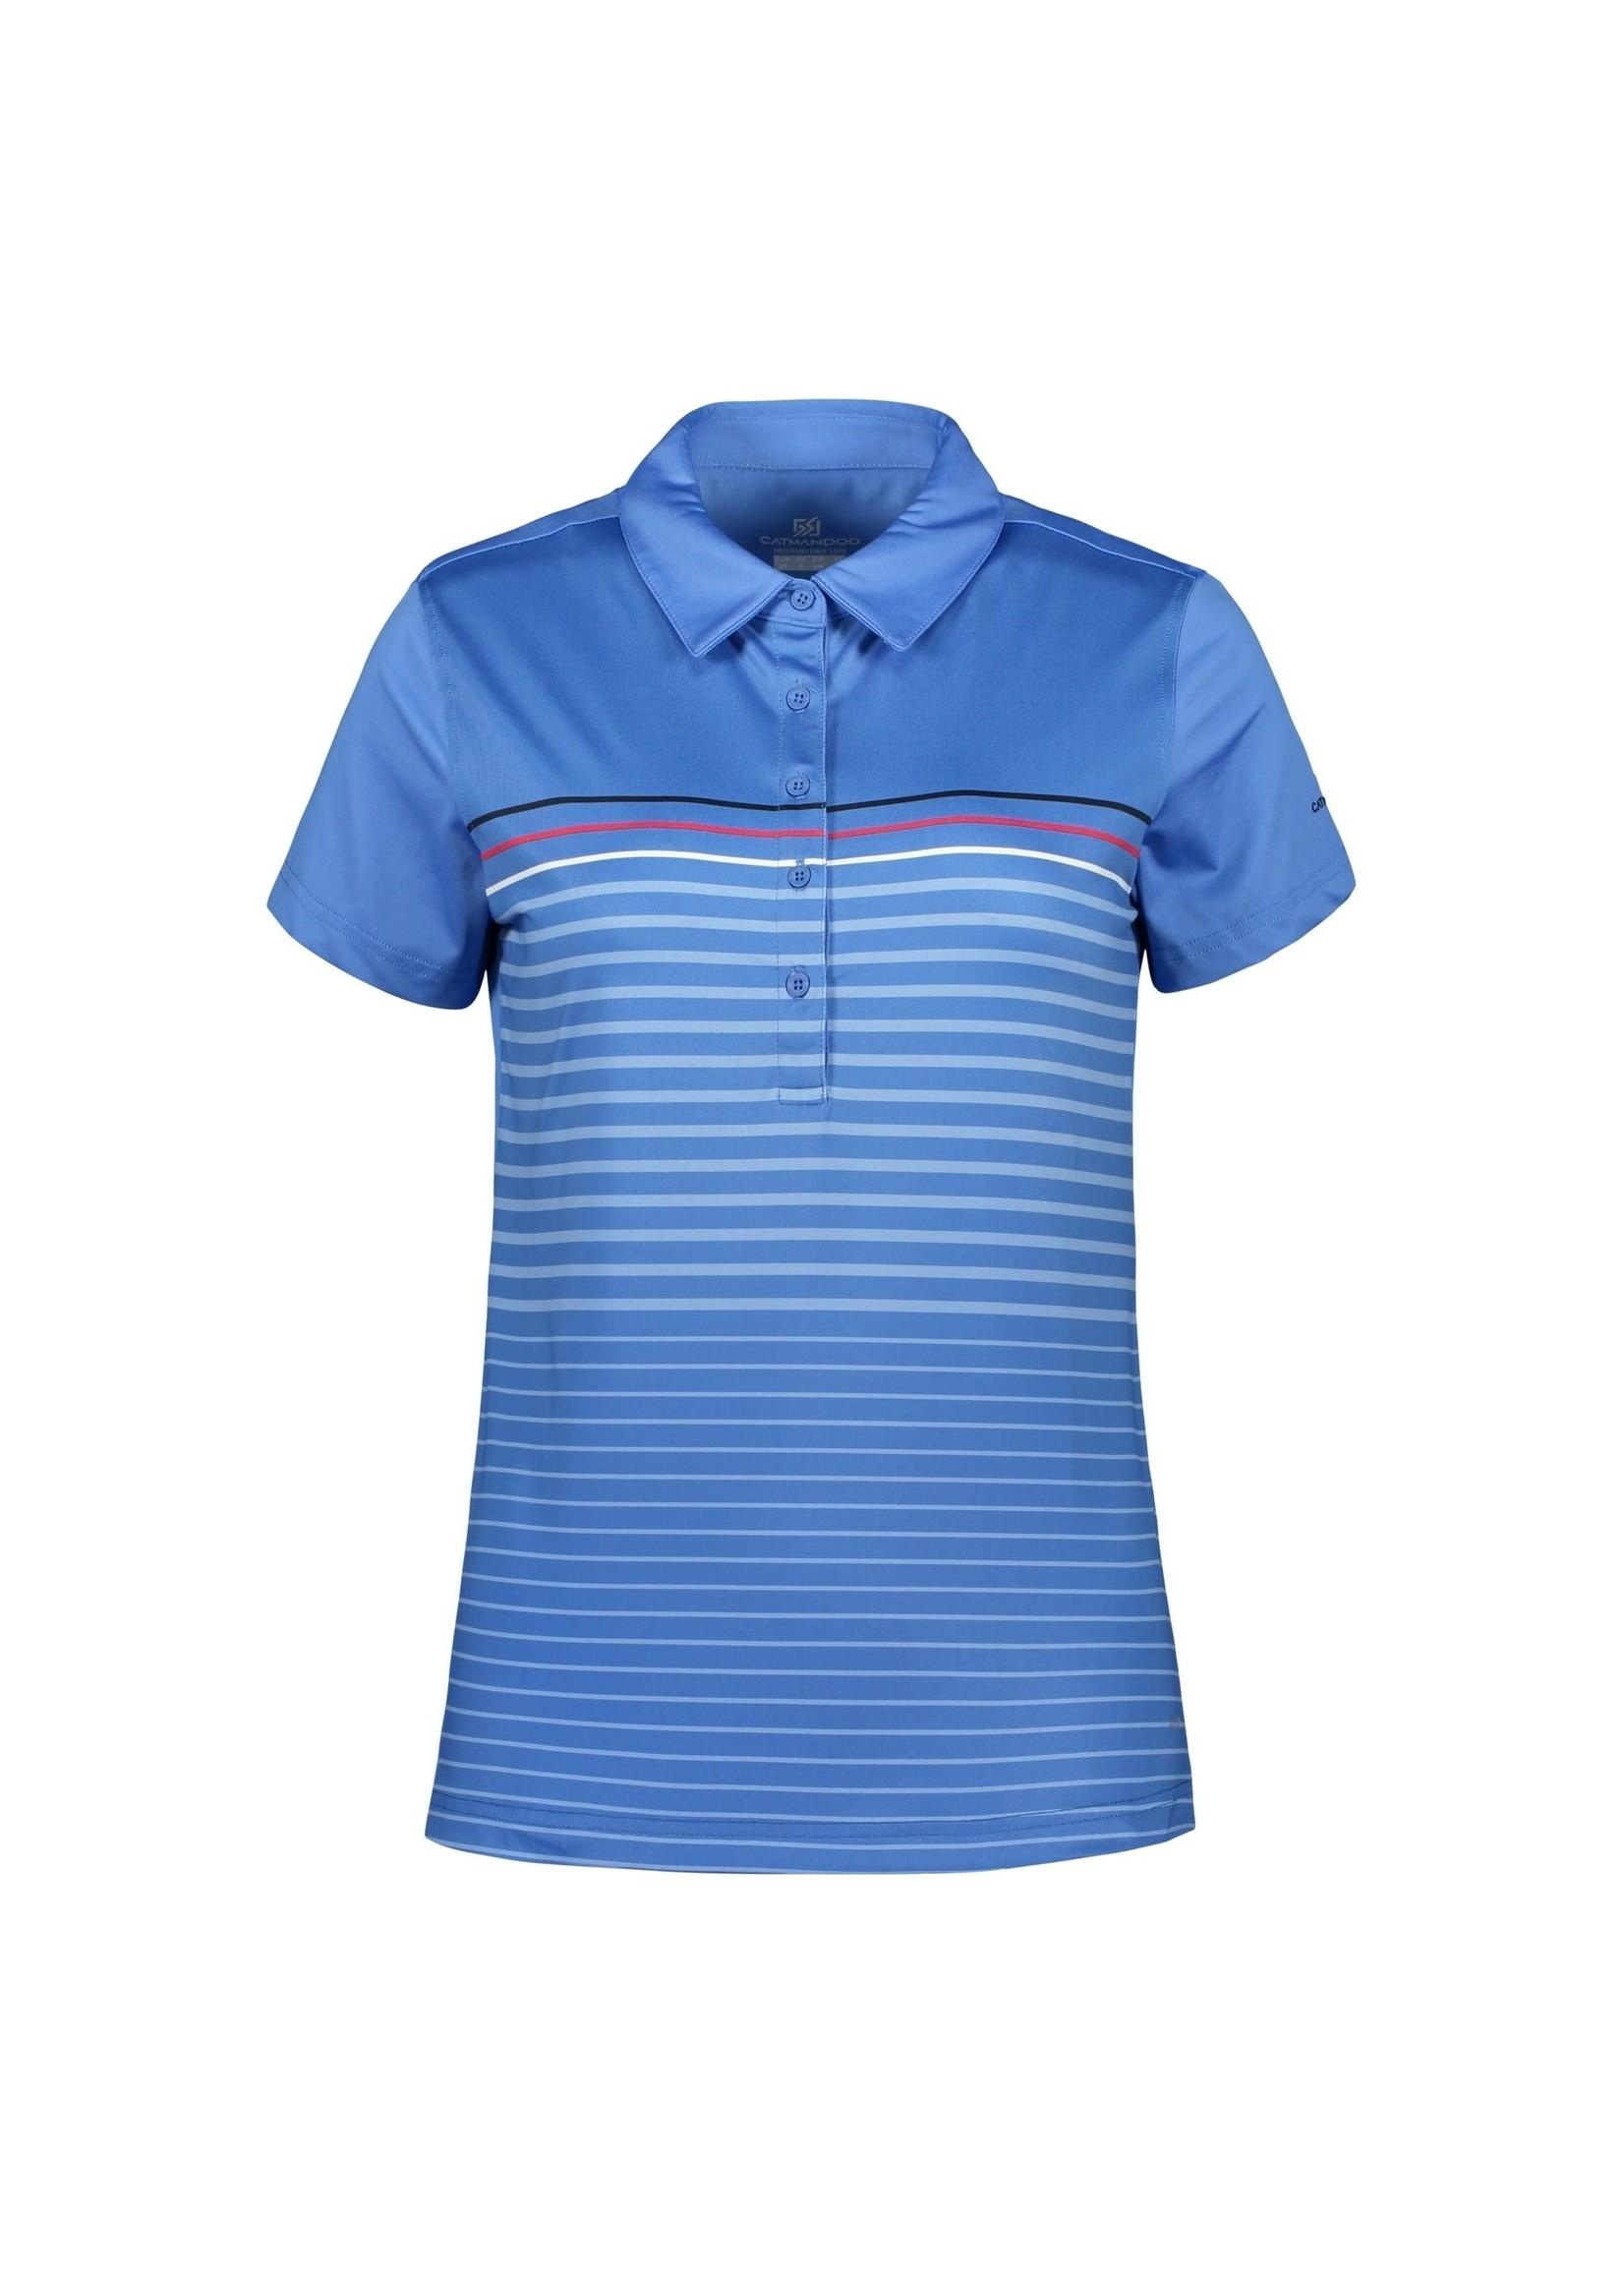 Catmandoo Spry Ladies Polo Shirt, Blue/Red/White